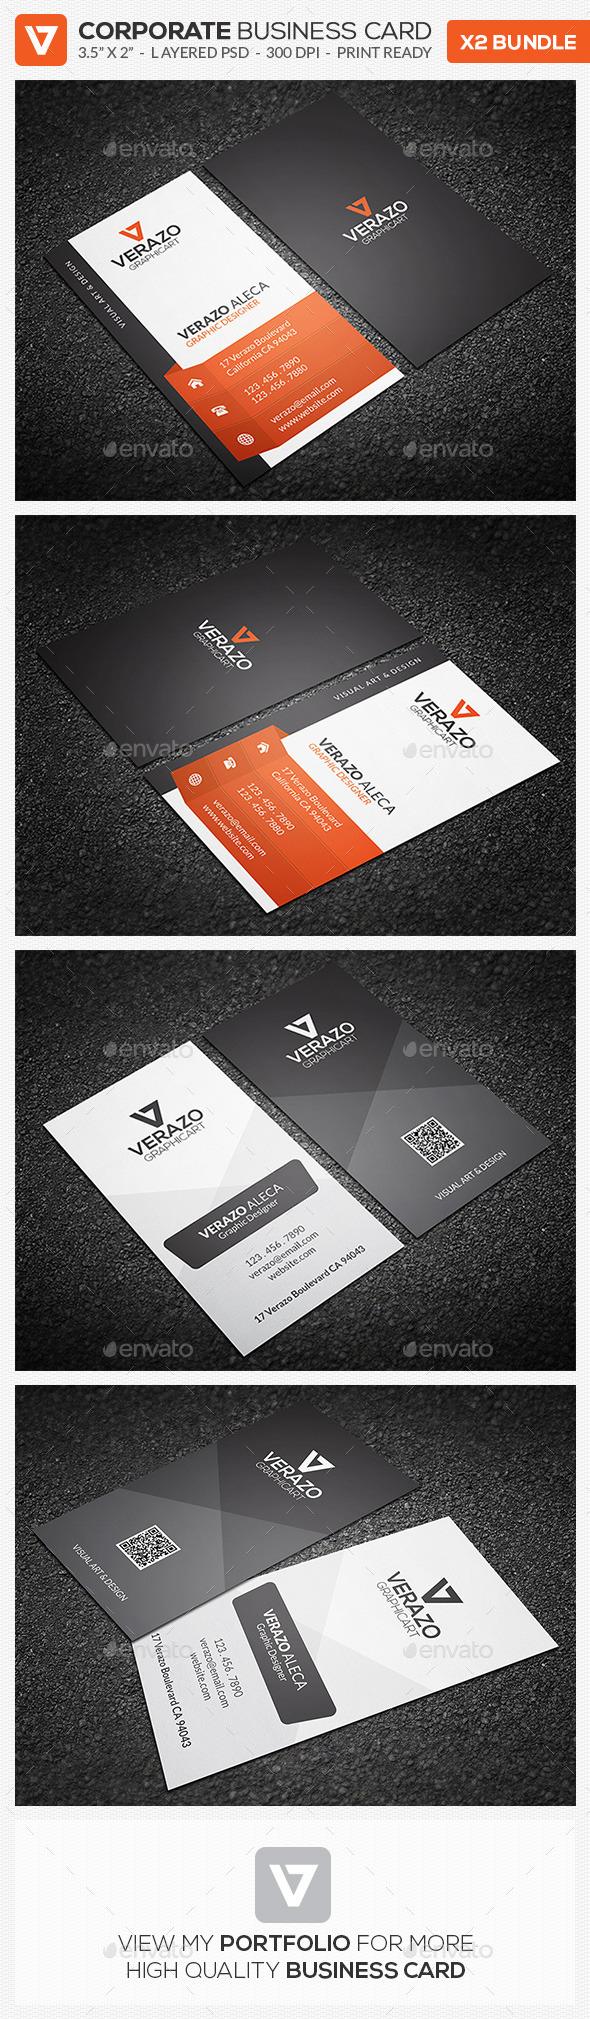 Business Card Bundle 21 - Corporate Business Cards